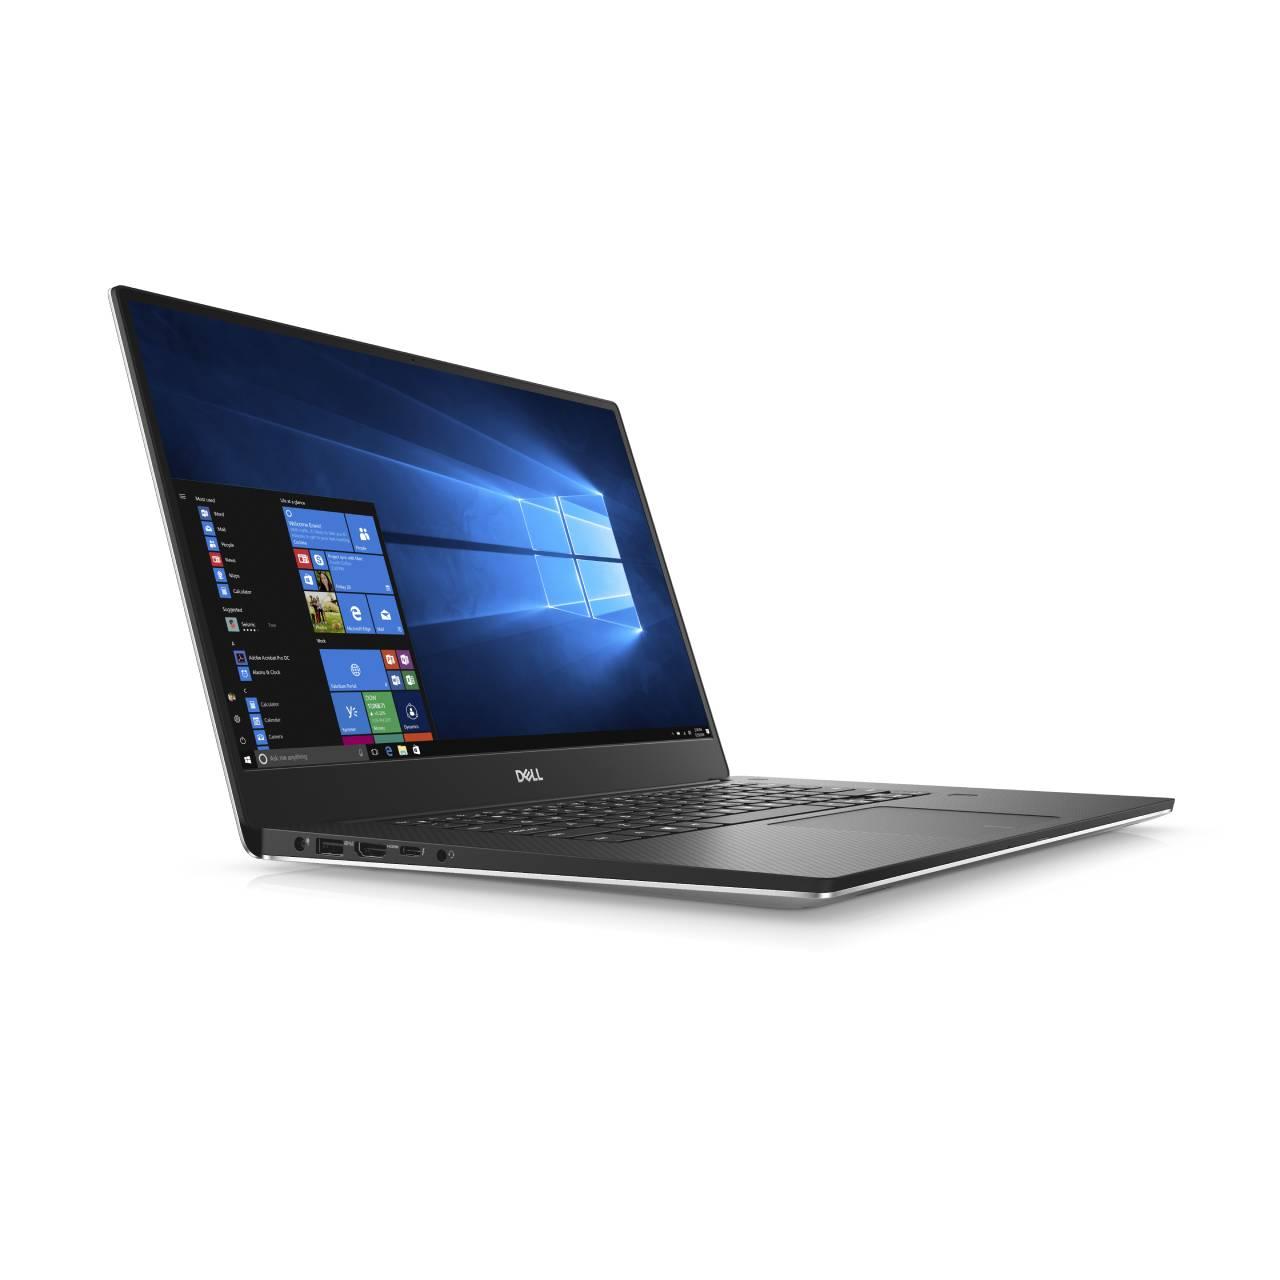 Dell XPS 15 7590 Laptop 15 6